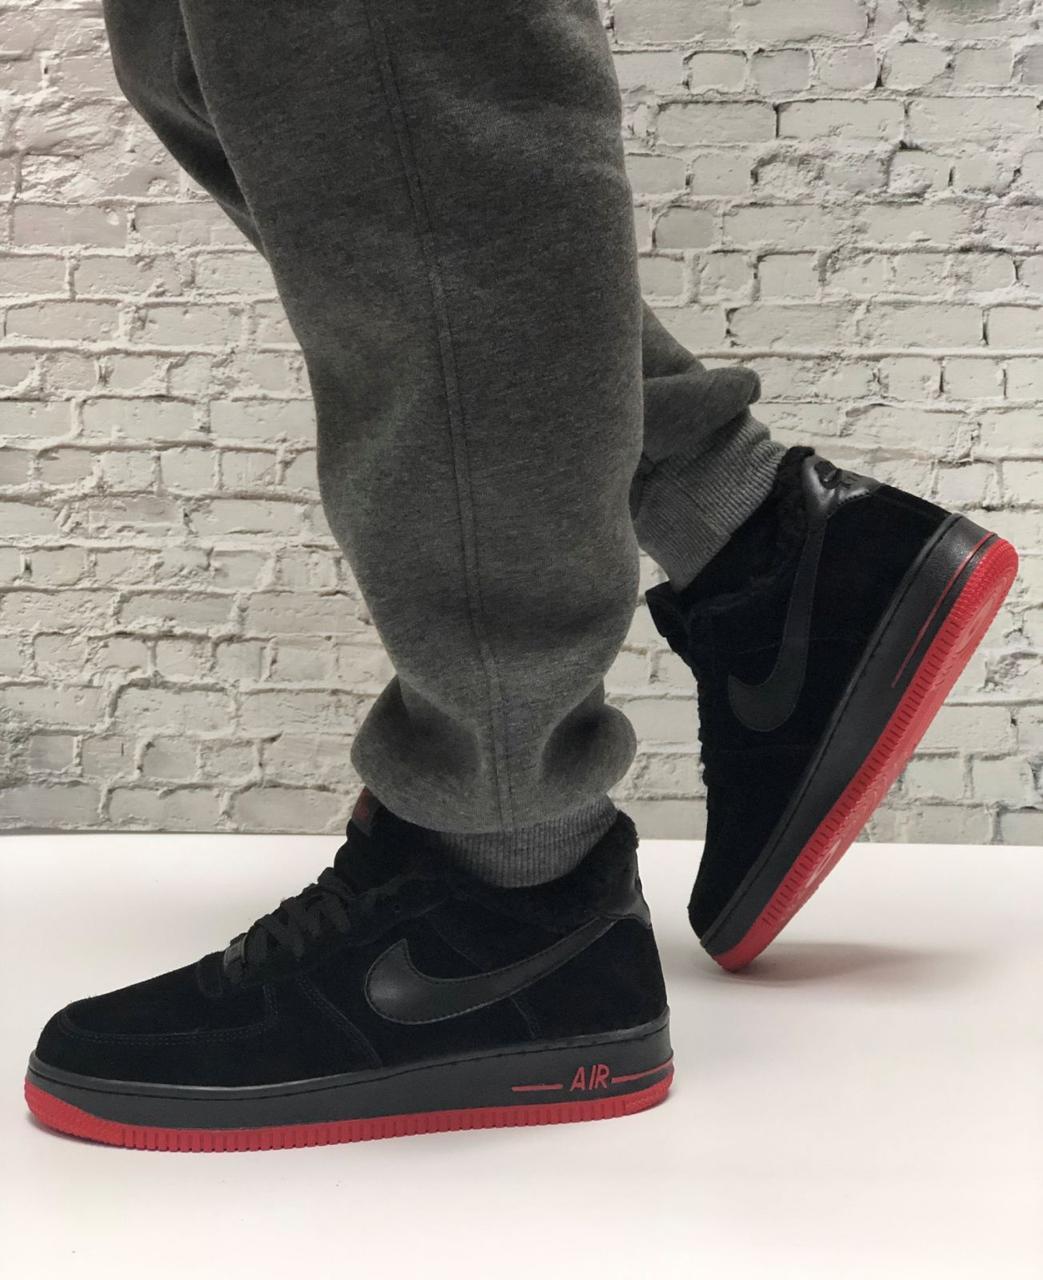 Кроссовки мужские зимние Nike Air Force low Black/Red (Реплика ААА)